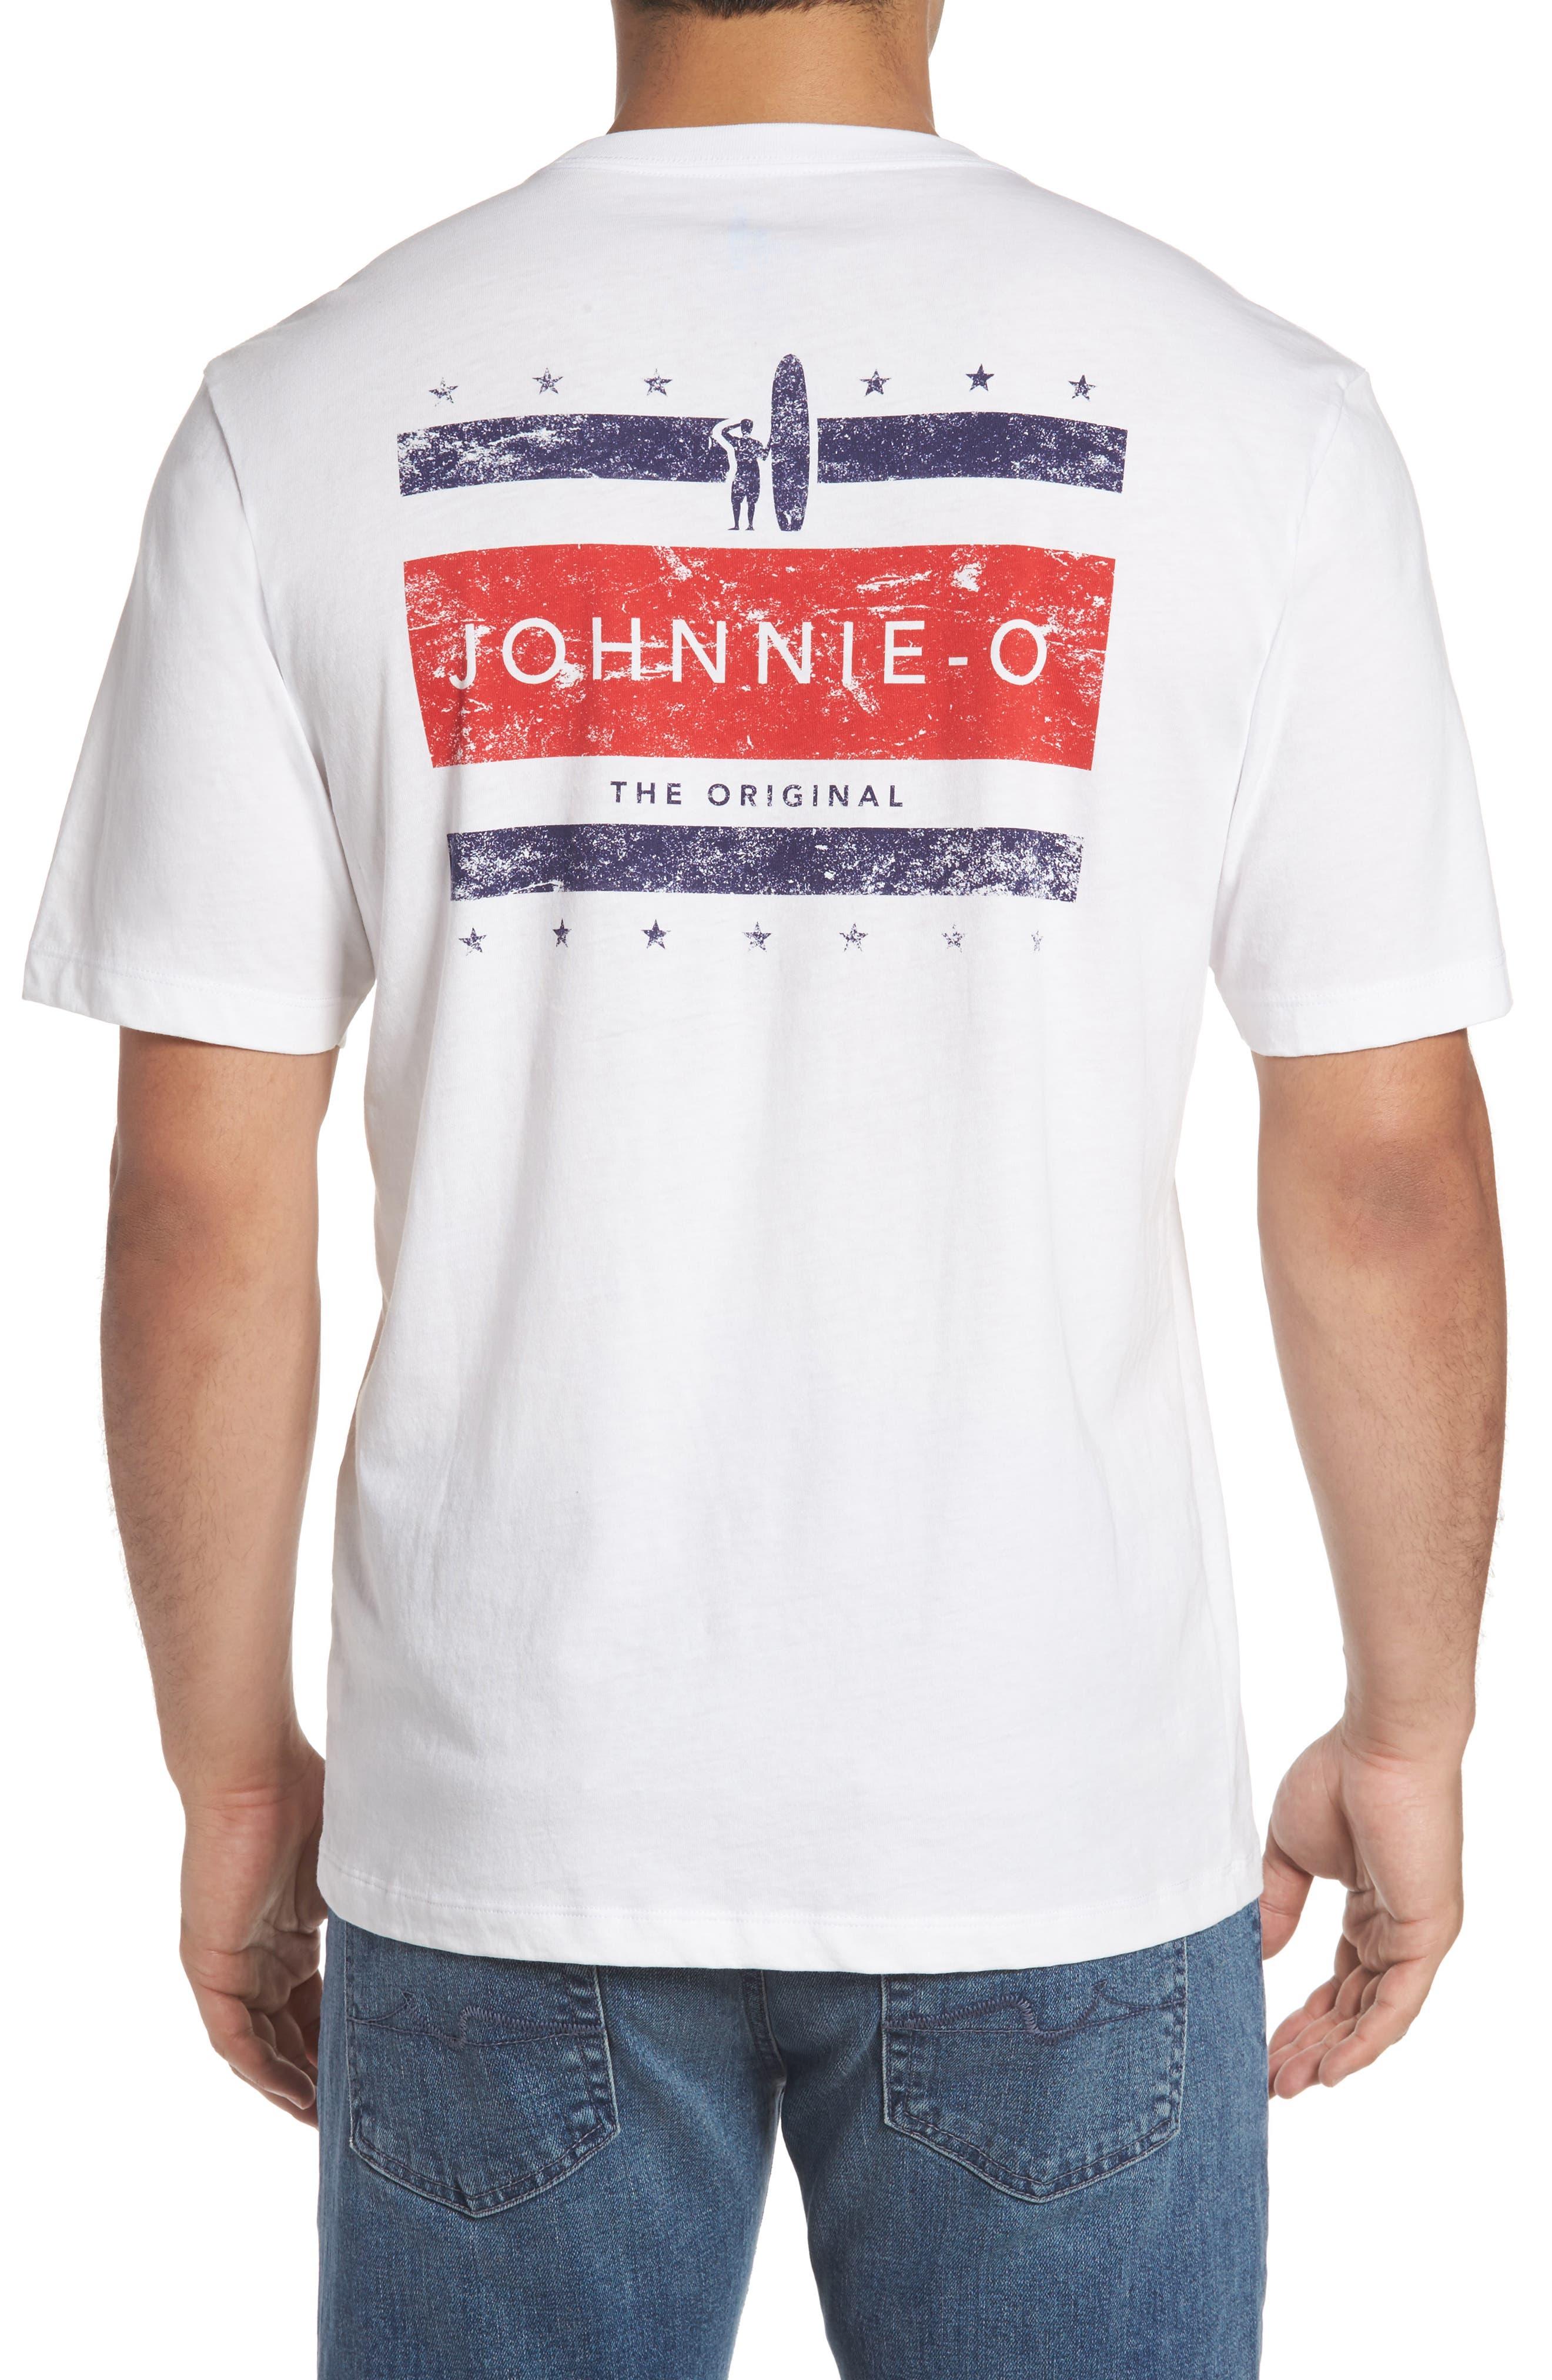 Main Image - johnnie-O Union Graphic T-Shirt